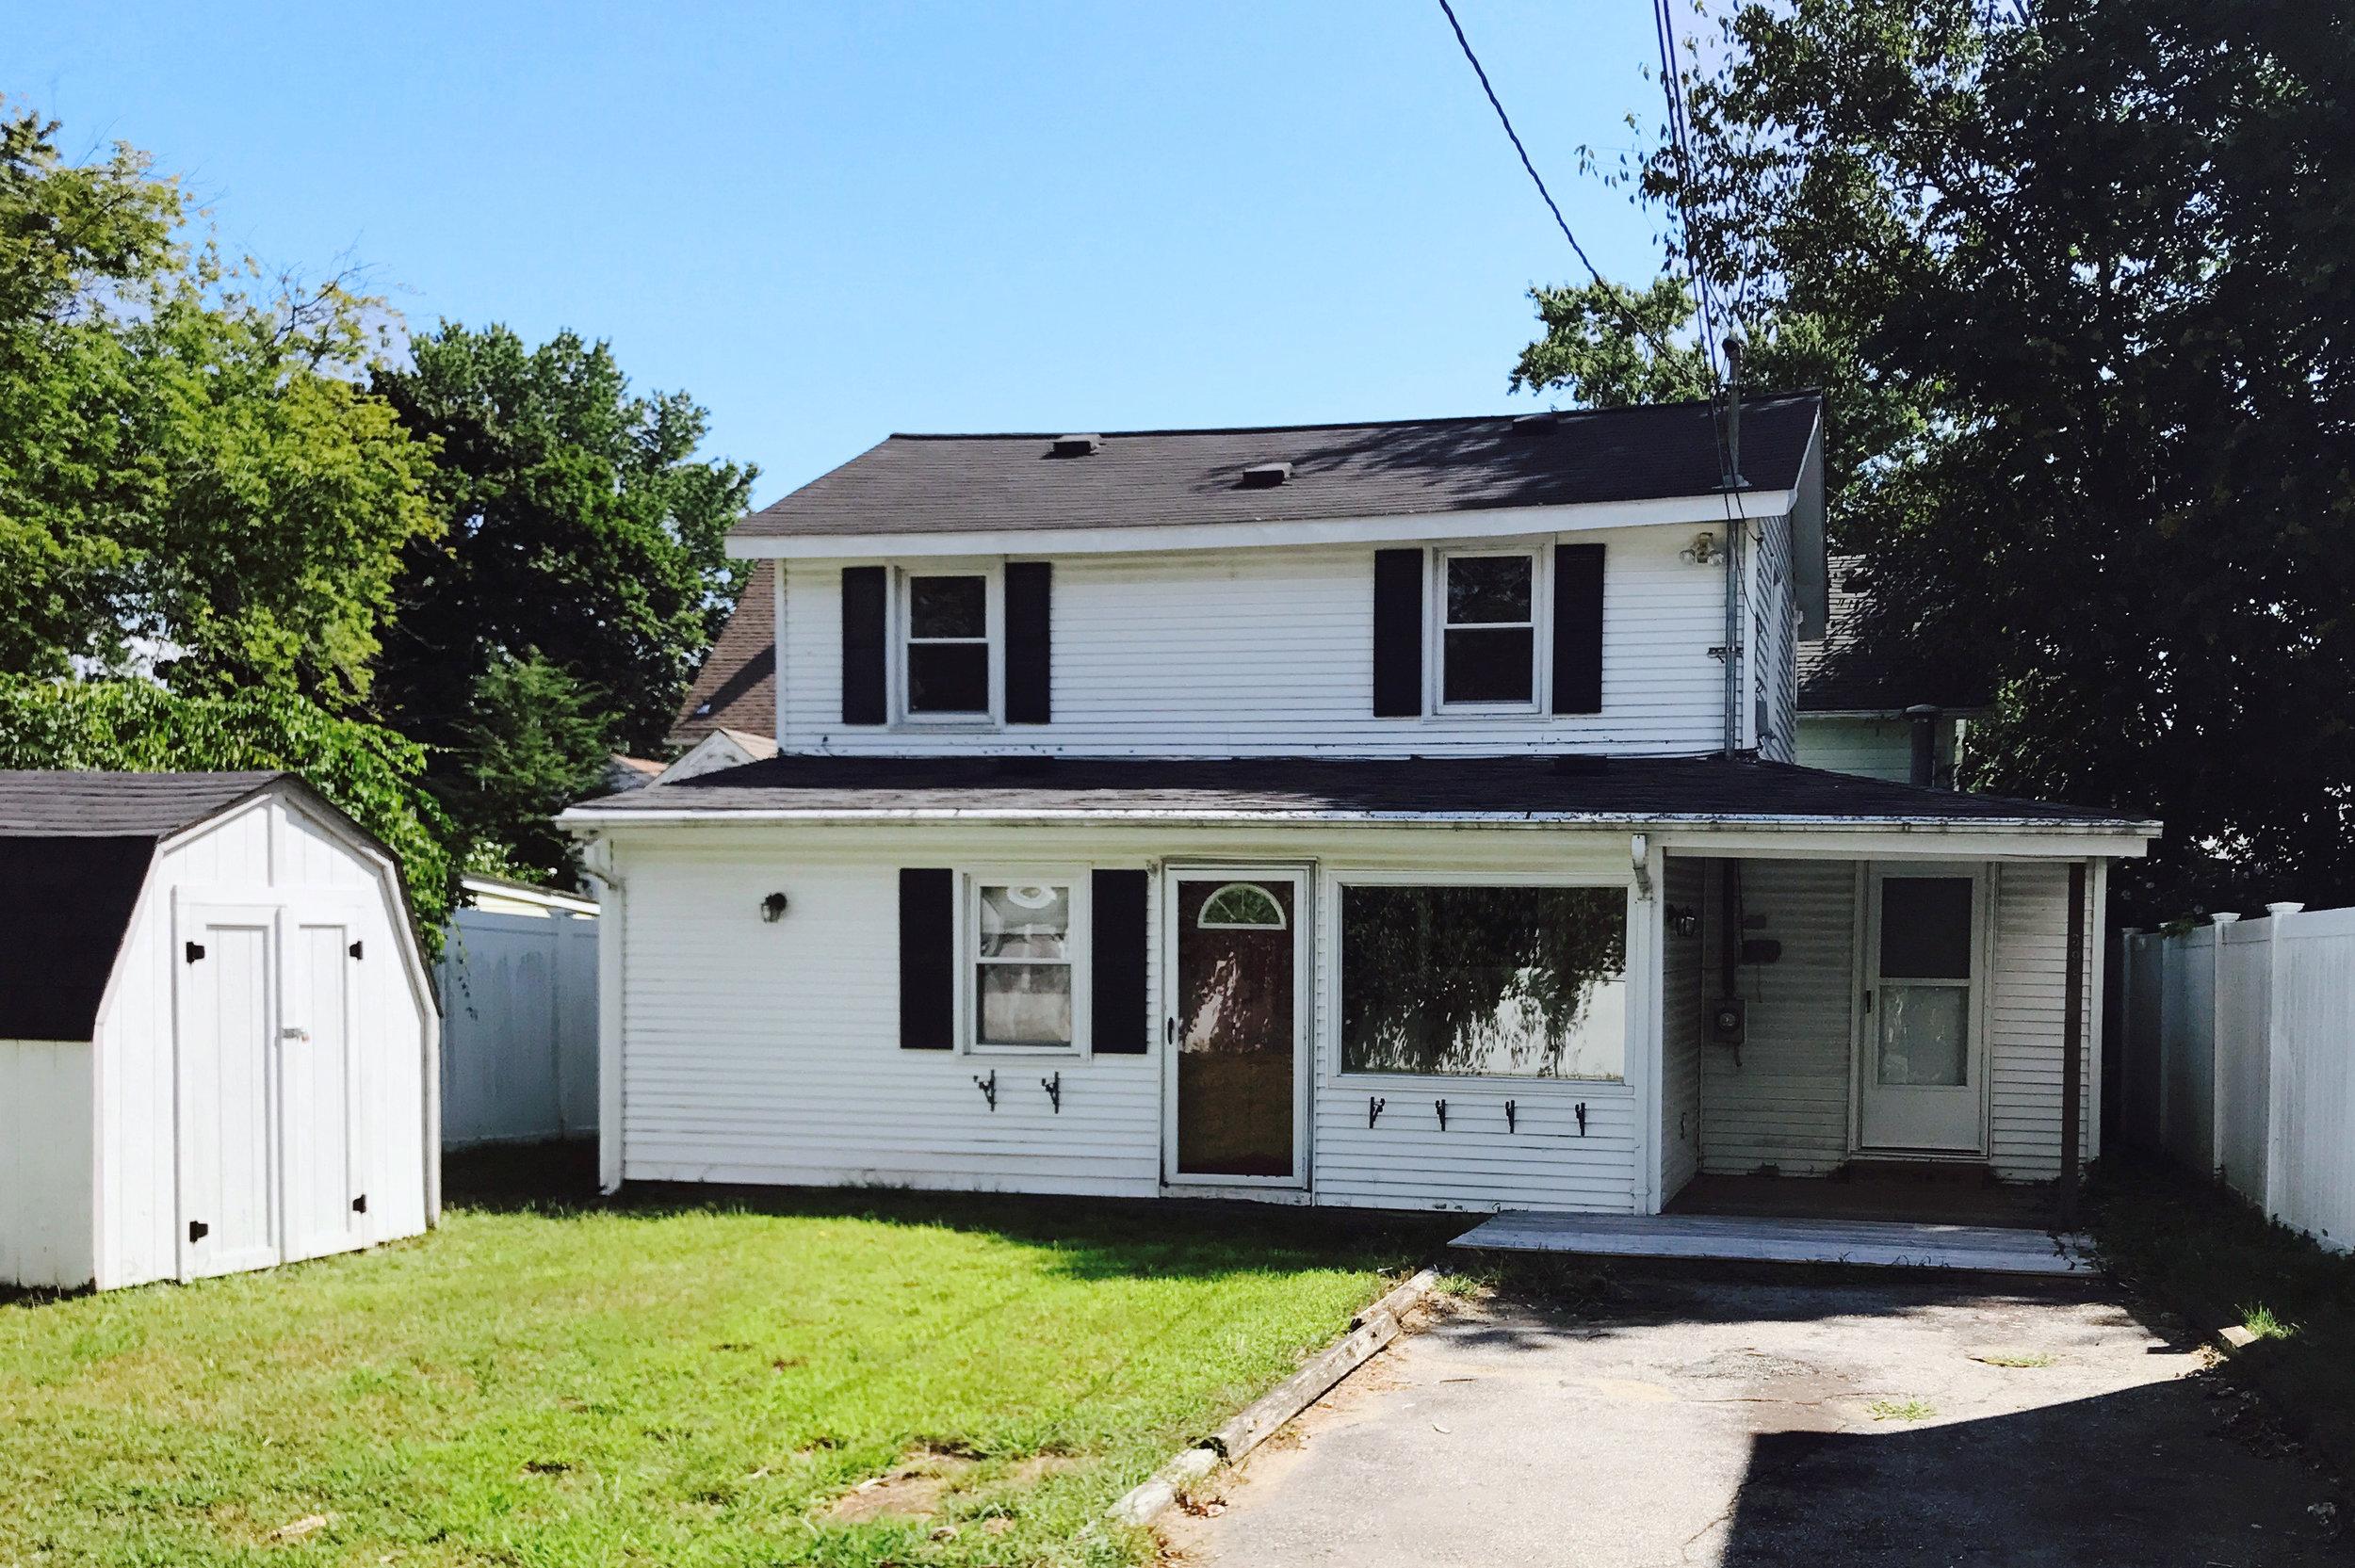 Warwick, RI - Closed September 1, 2017